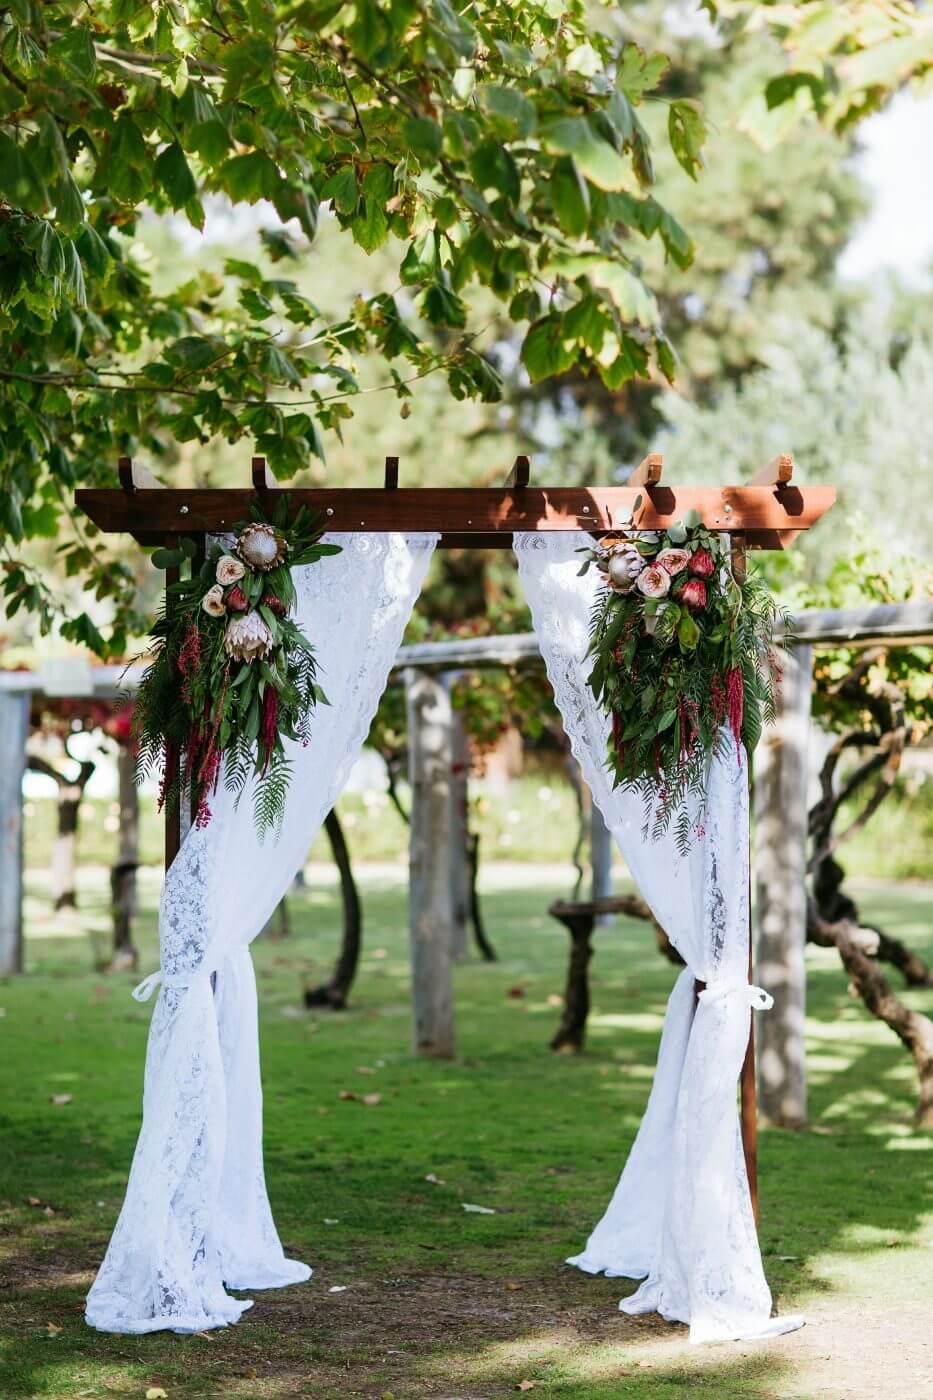 Kate Drennan Photography | Perth Wedding Photographer